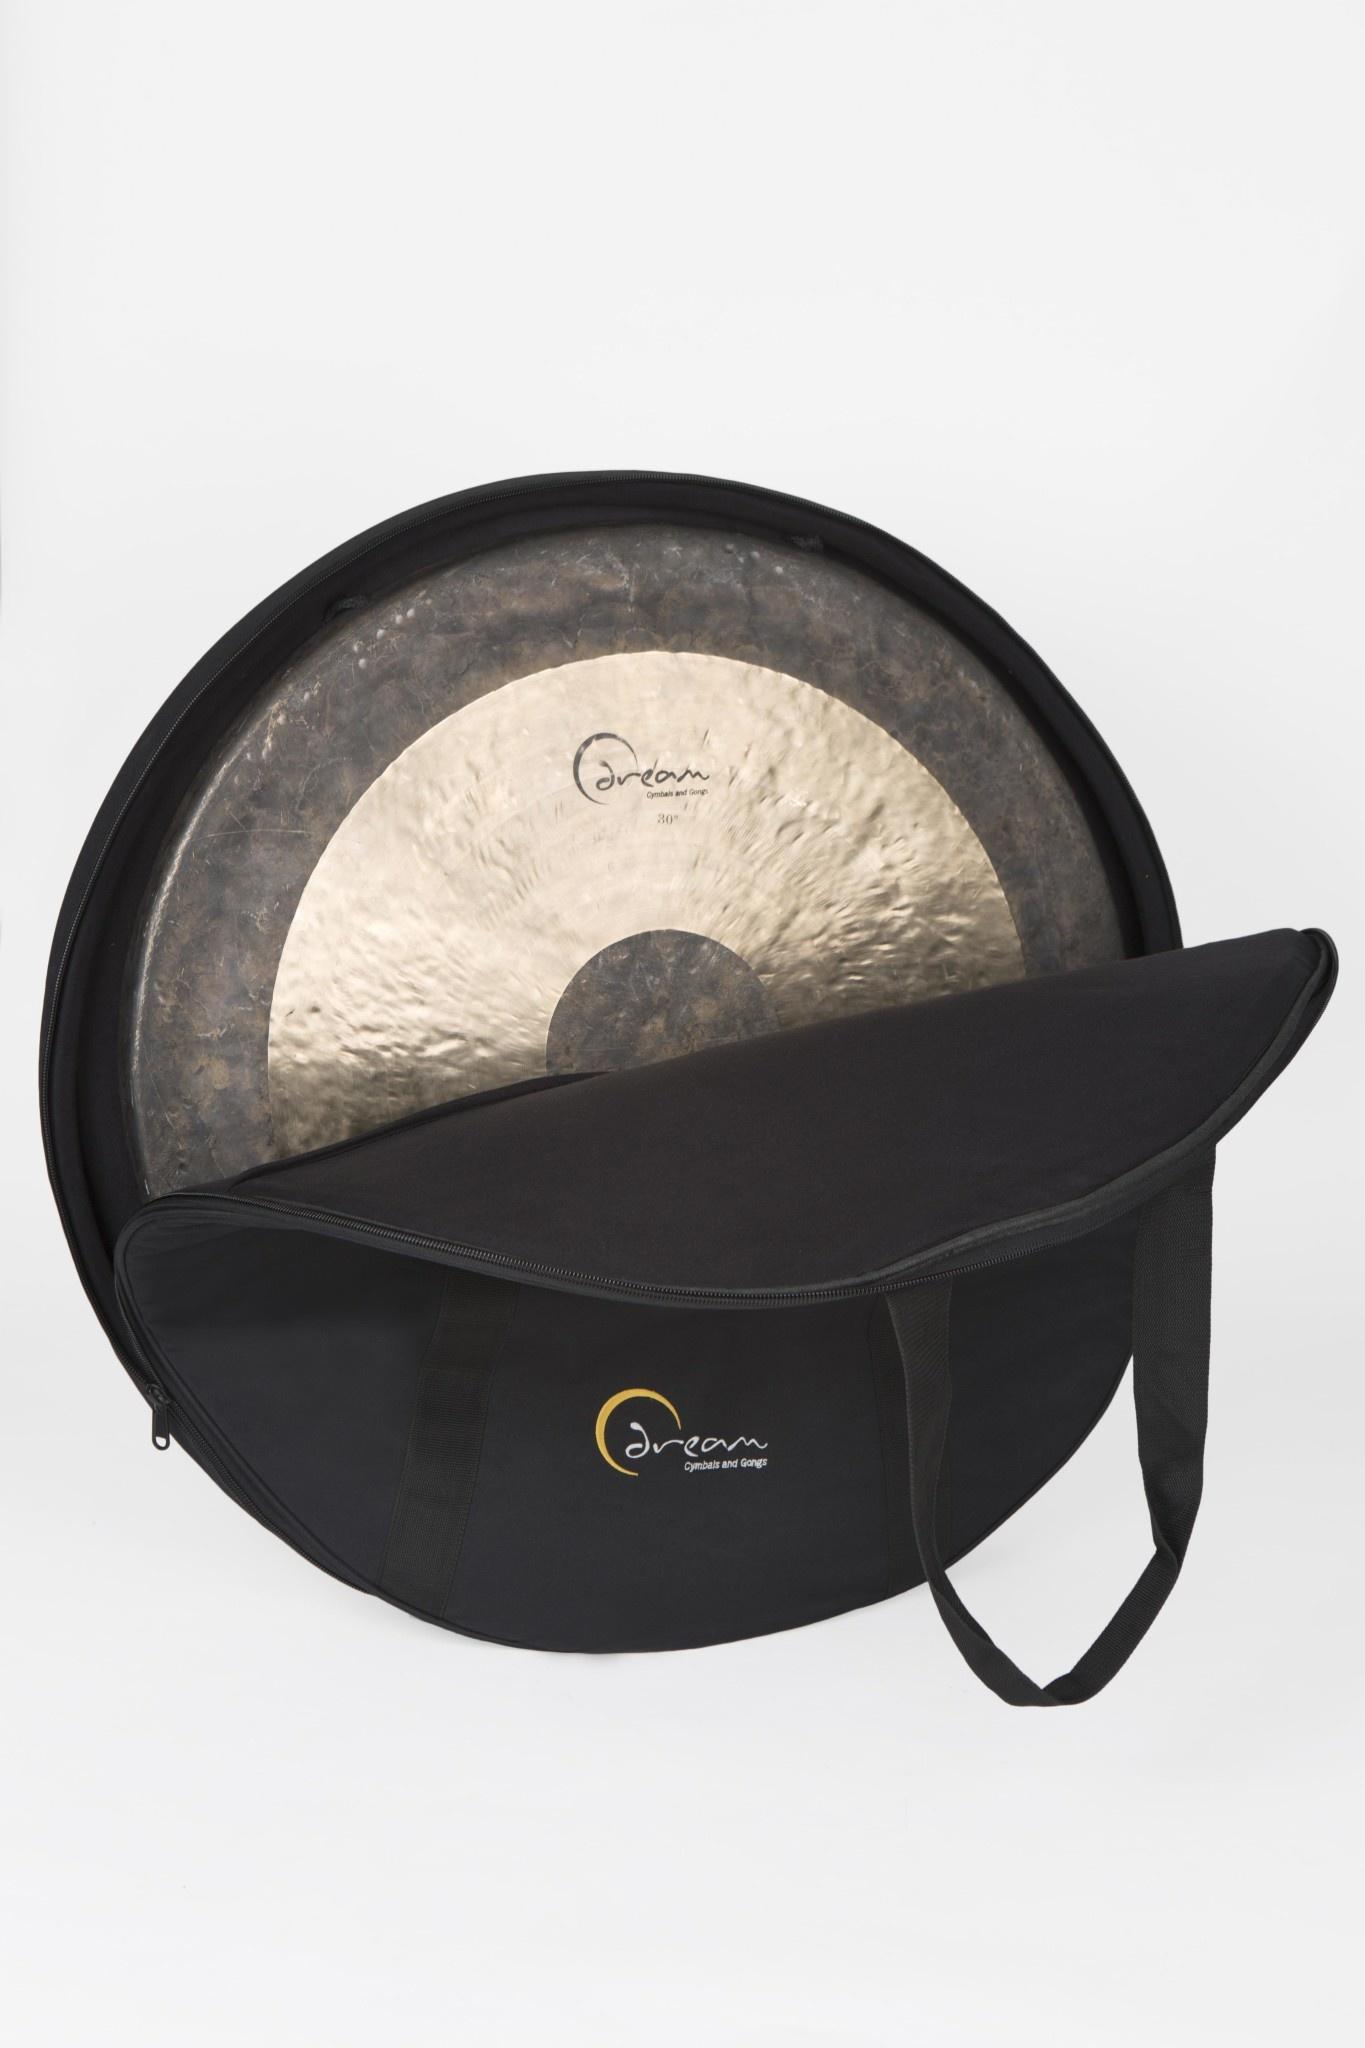 Dream Dream Gong Bag 36in